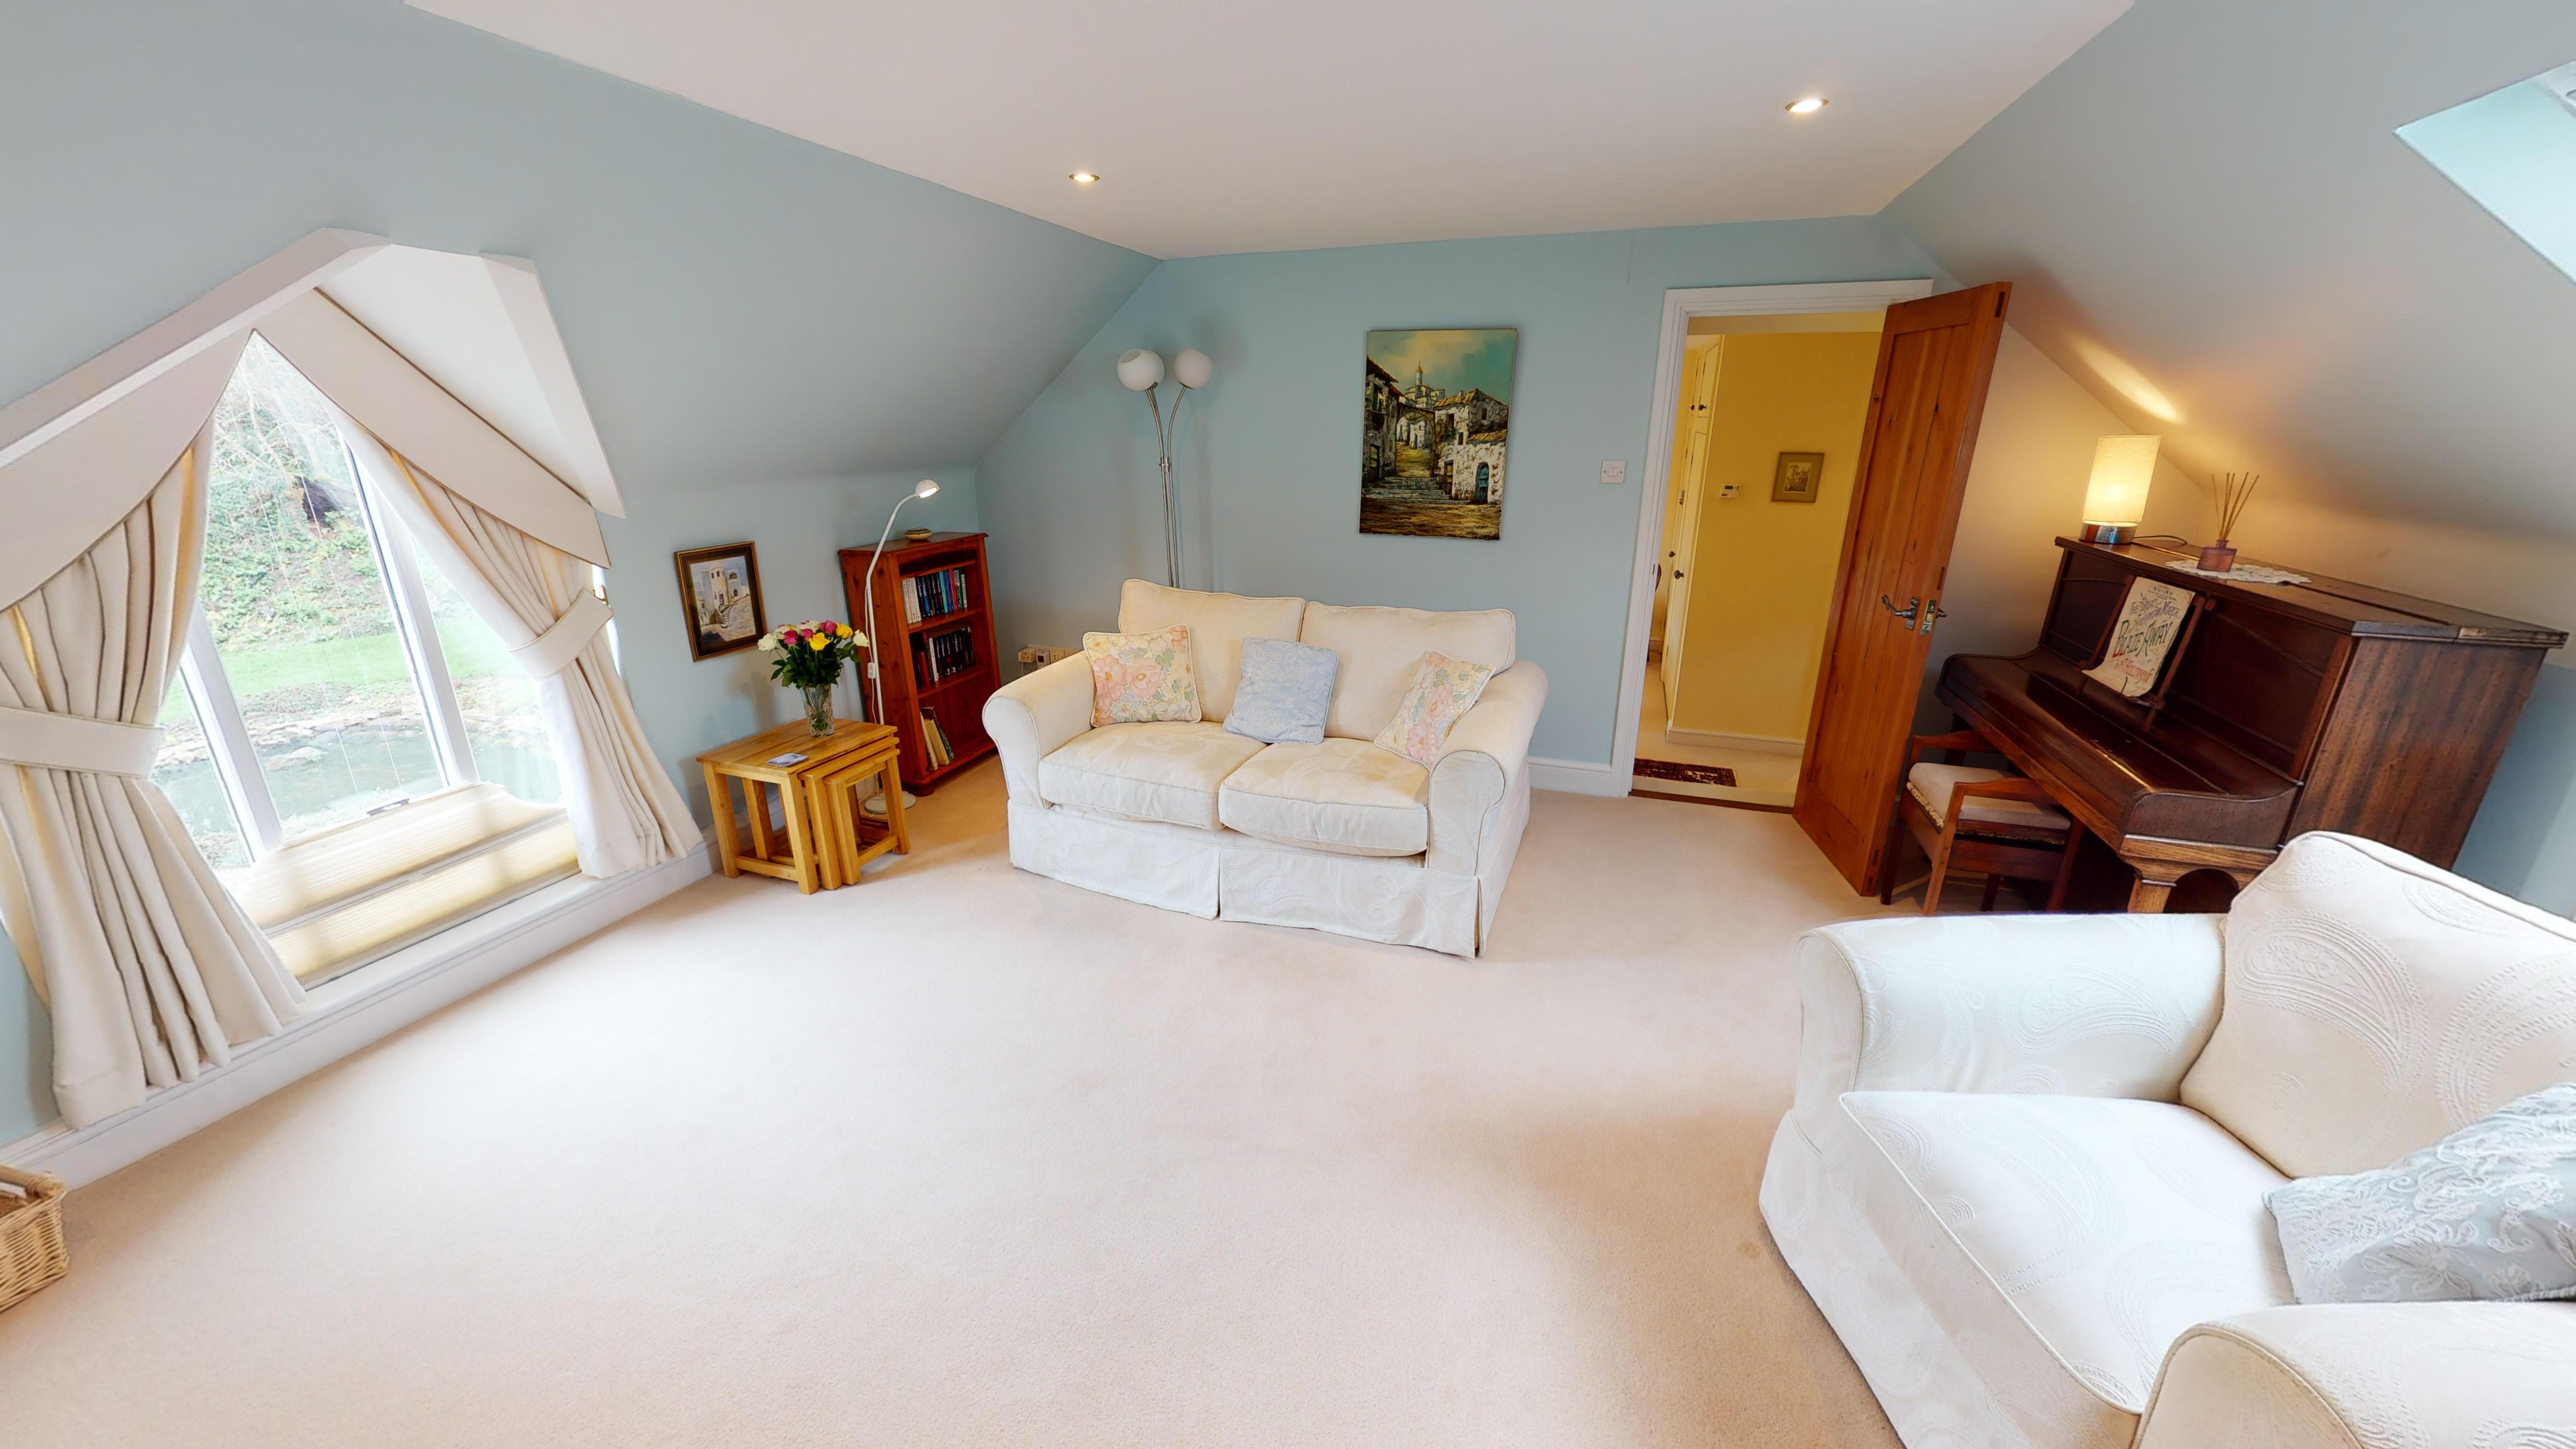 Coxes Cottage 03032020 174952 Lounge 2